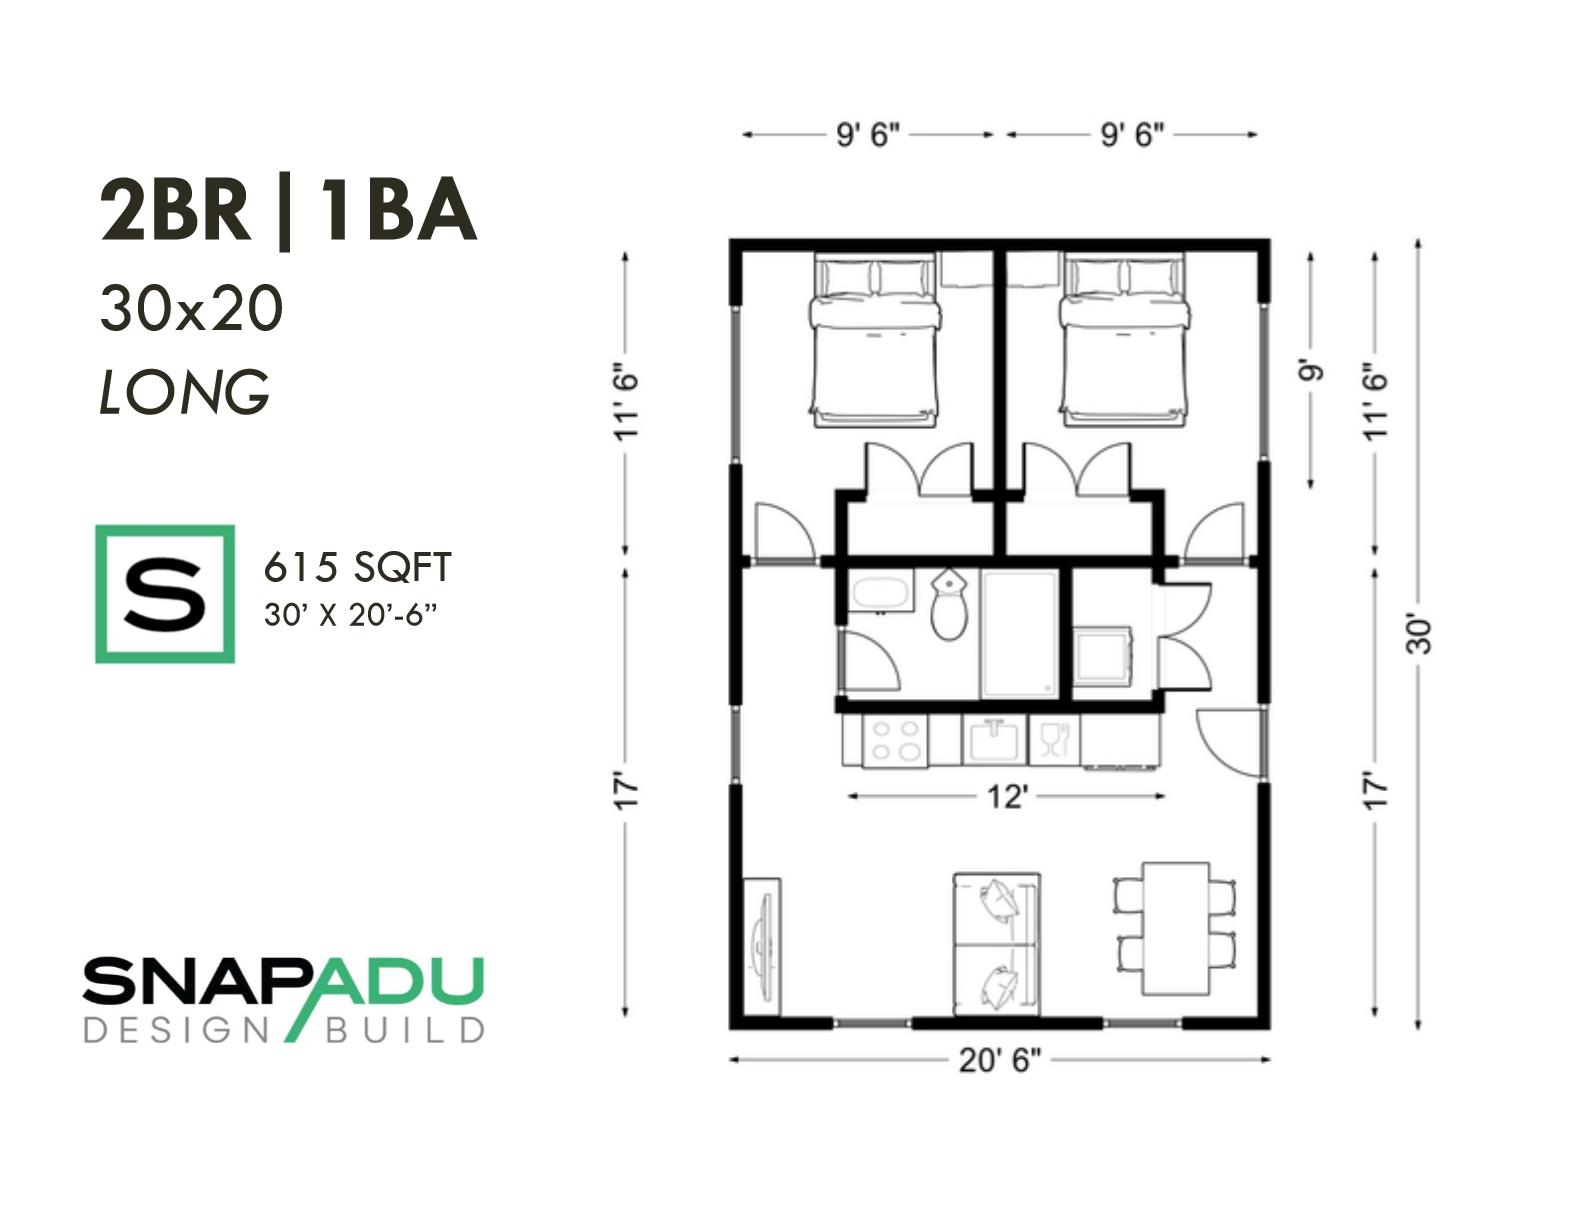 2BR 1BA 600 sqft 30x20 LONG ADU floor plan